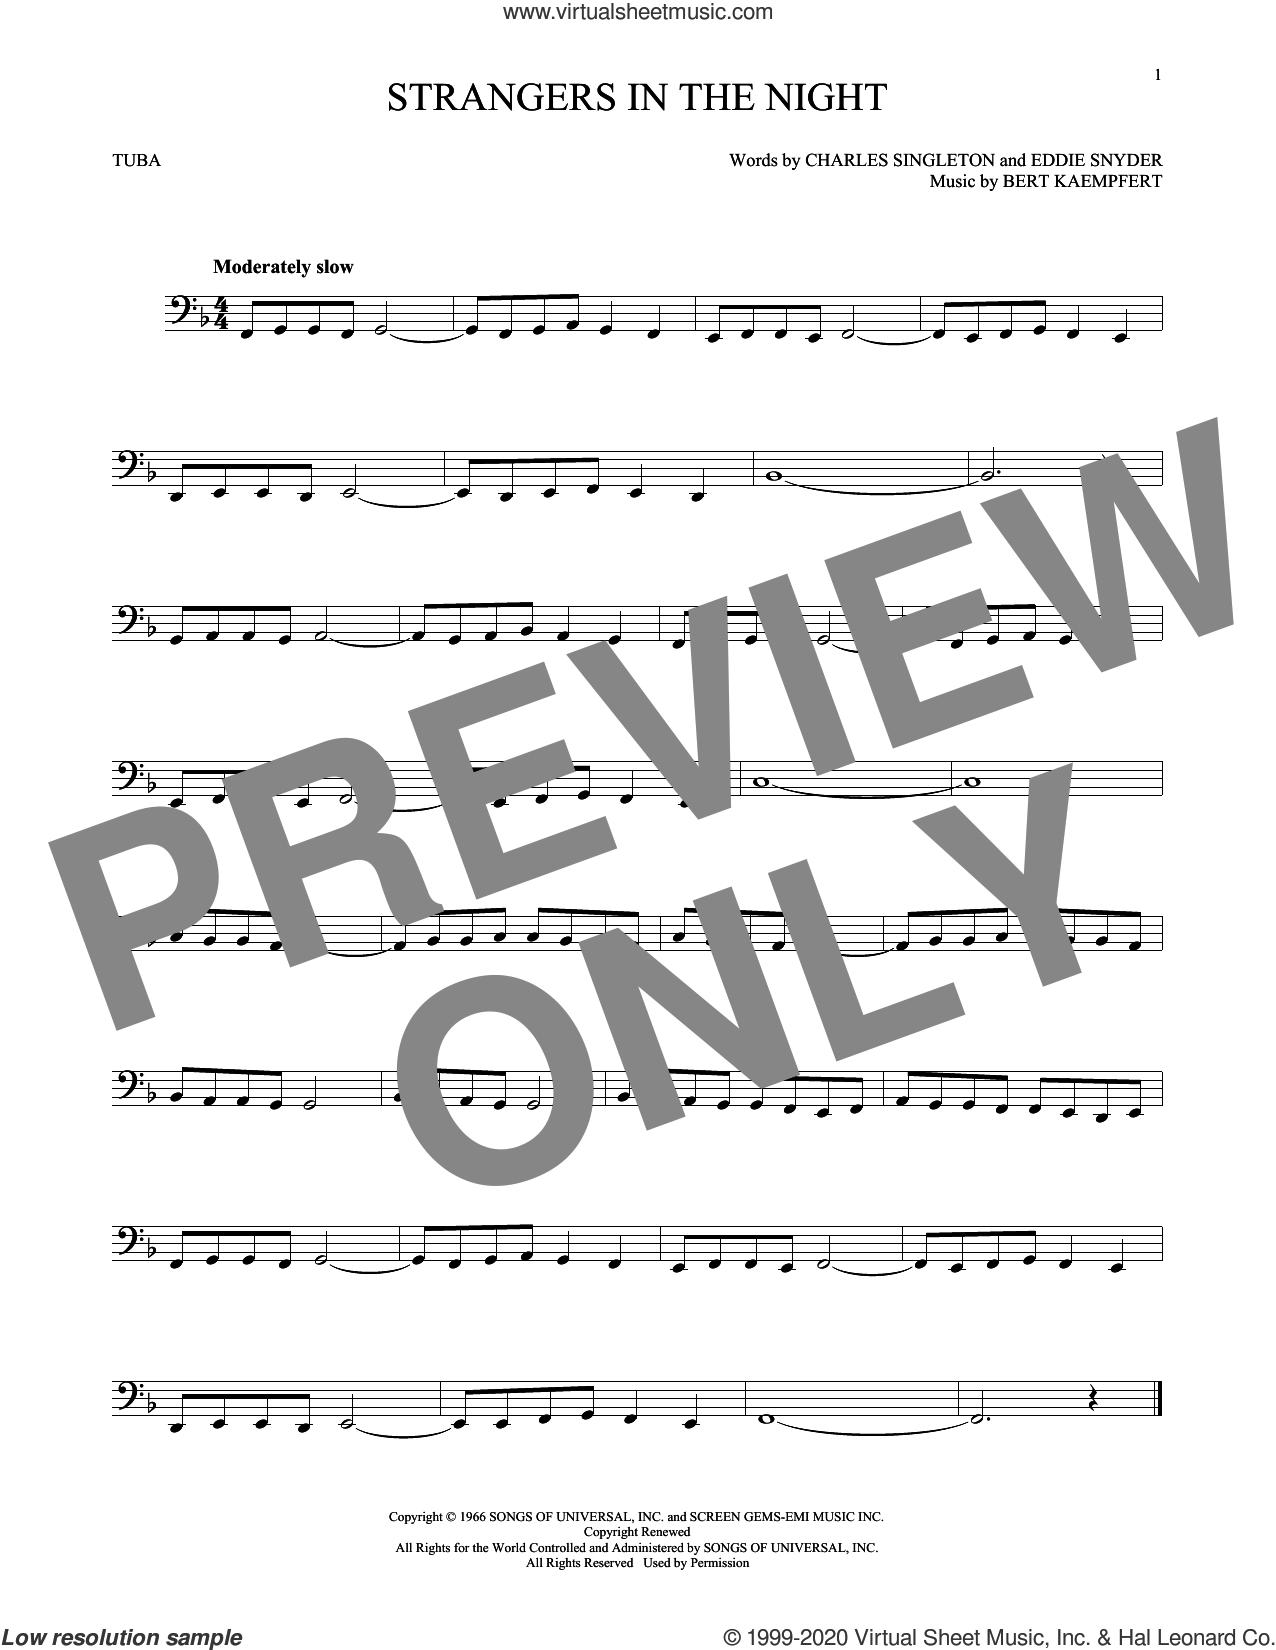 Strangers In The Night sheet music for Tuba Solo (tuba) by Frank Sinatra, Bert Kaempfert, Charles Singleton and Eddie Snyder, intermediate skill level